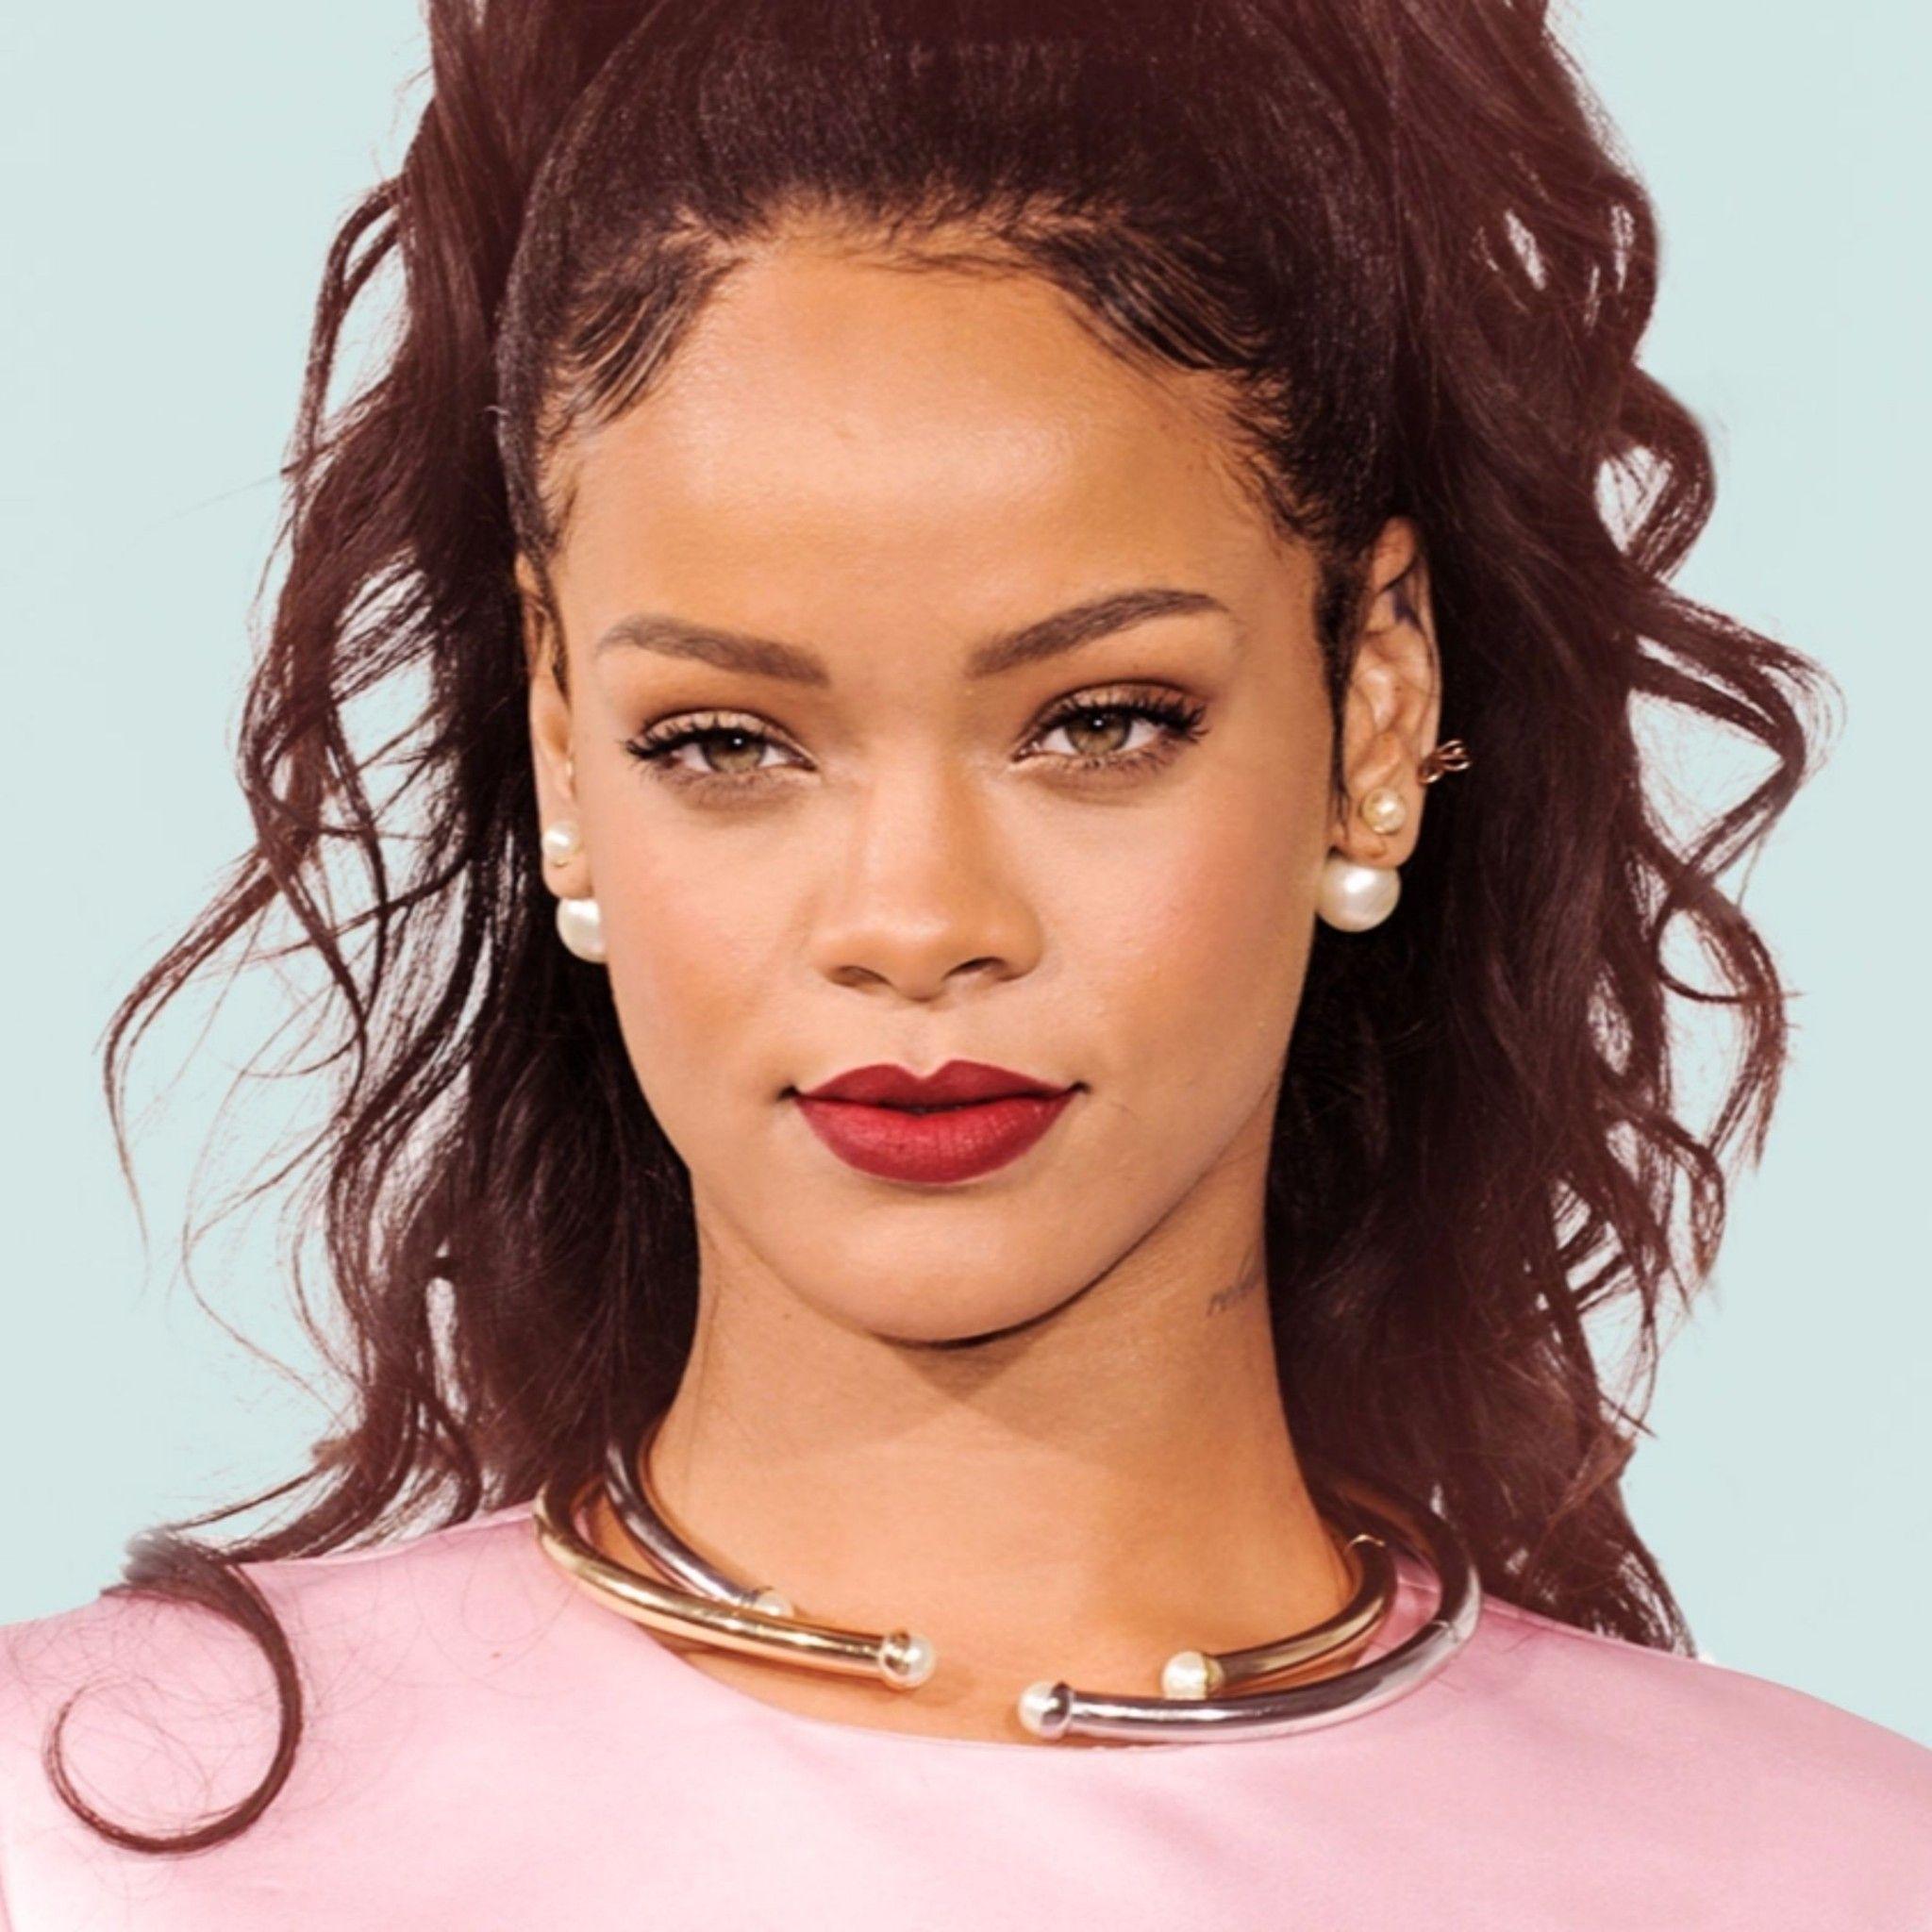 rihanna wallpaper iphone 633033 Rihanna, Peinados y